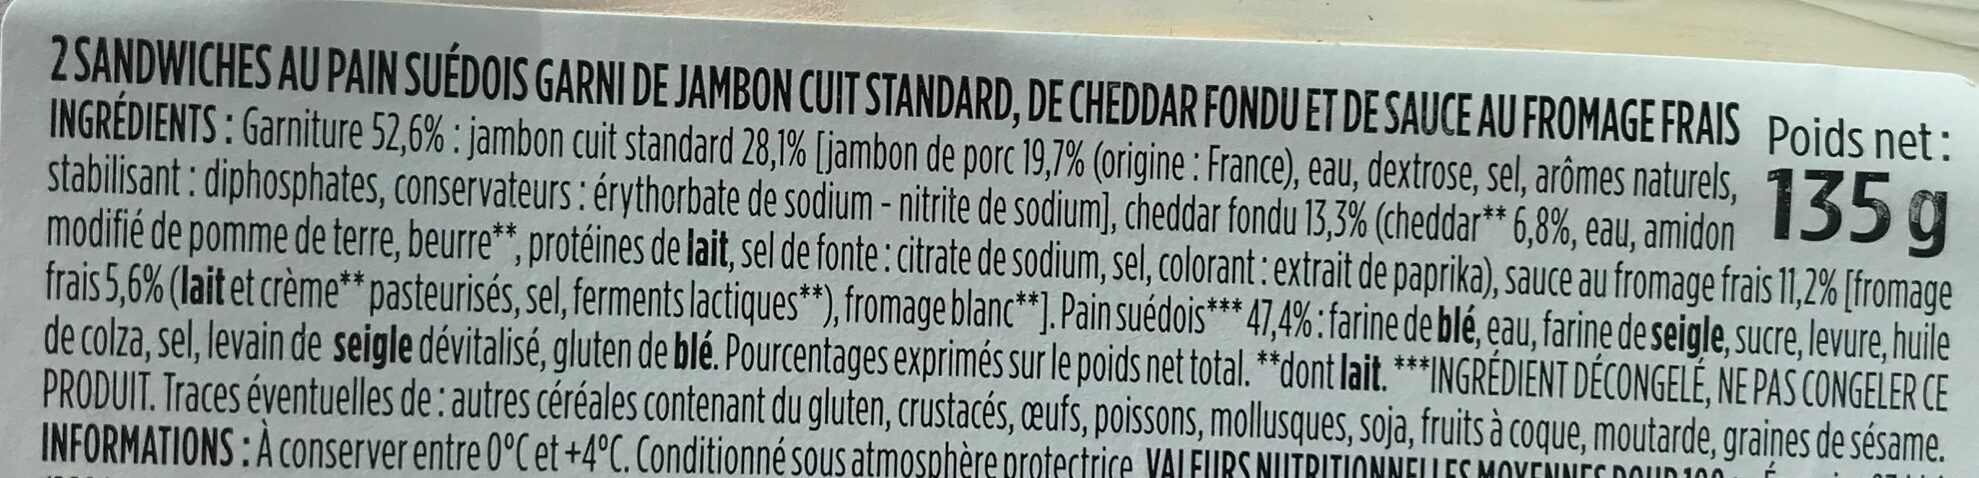 Sandwich jambon cheddar fondu pain suedois - Ingredients